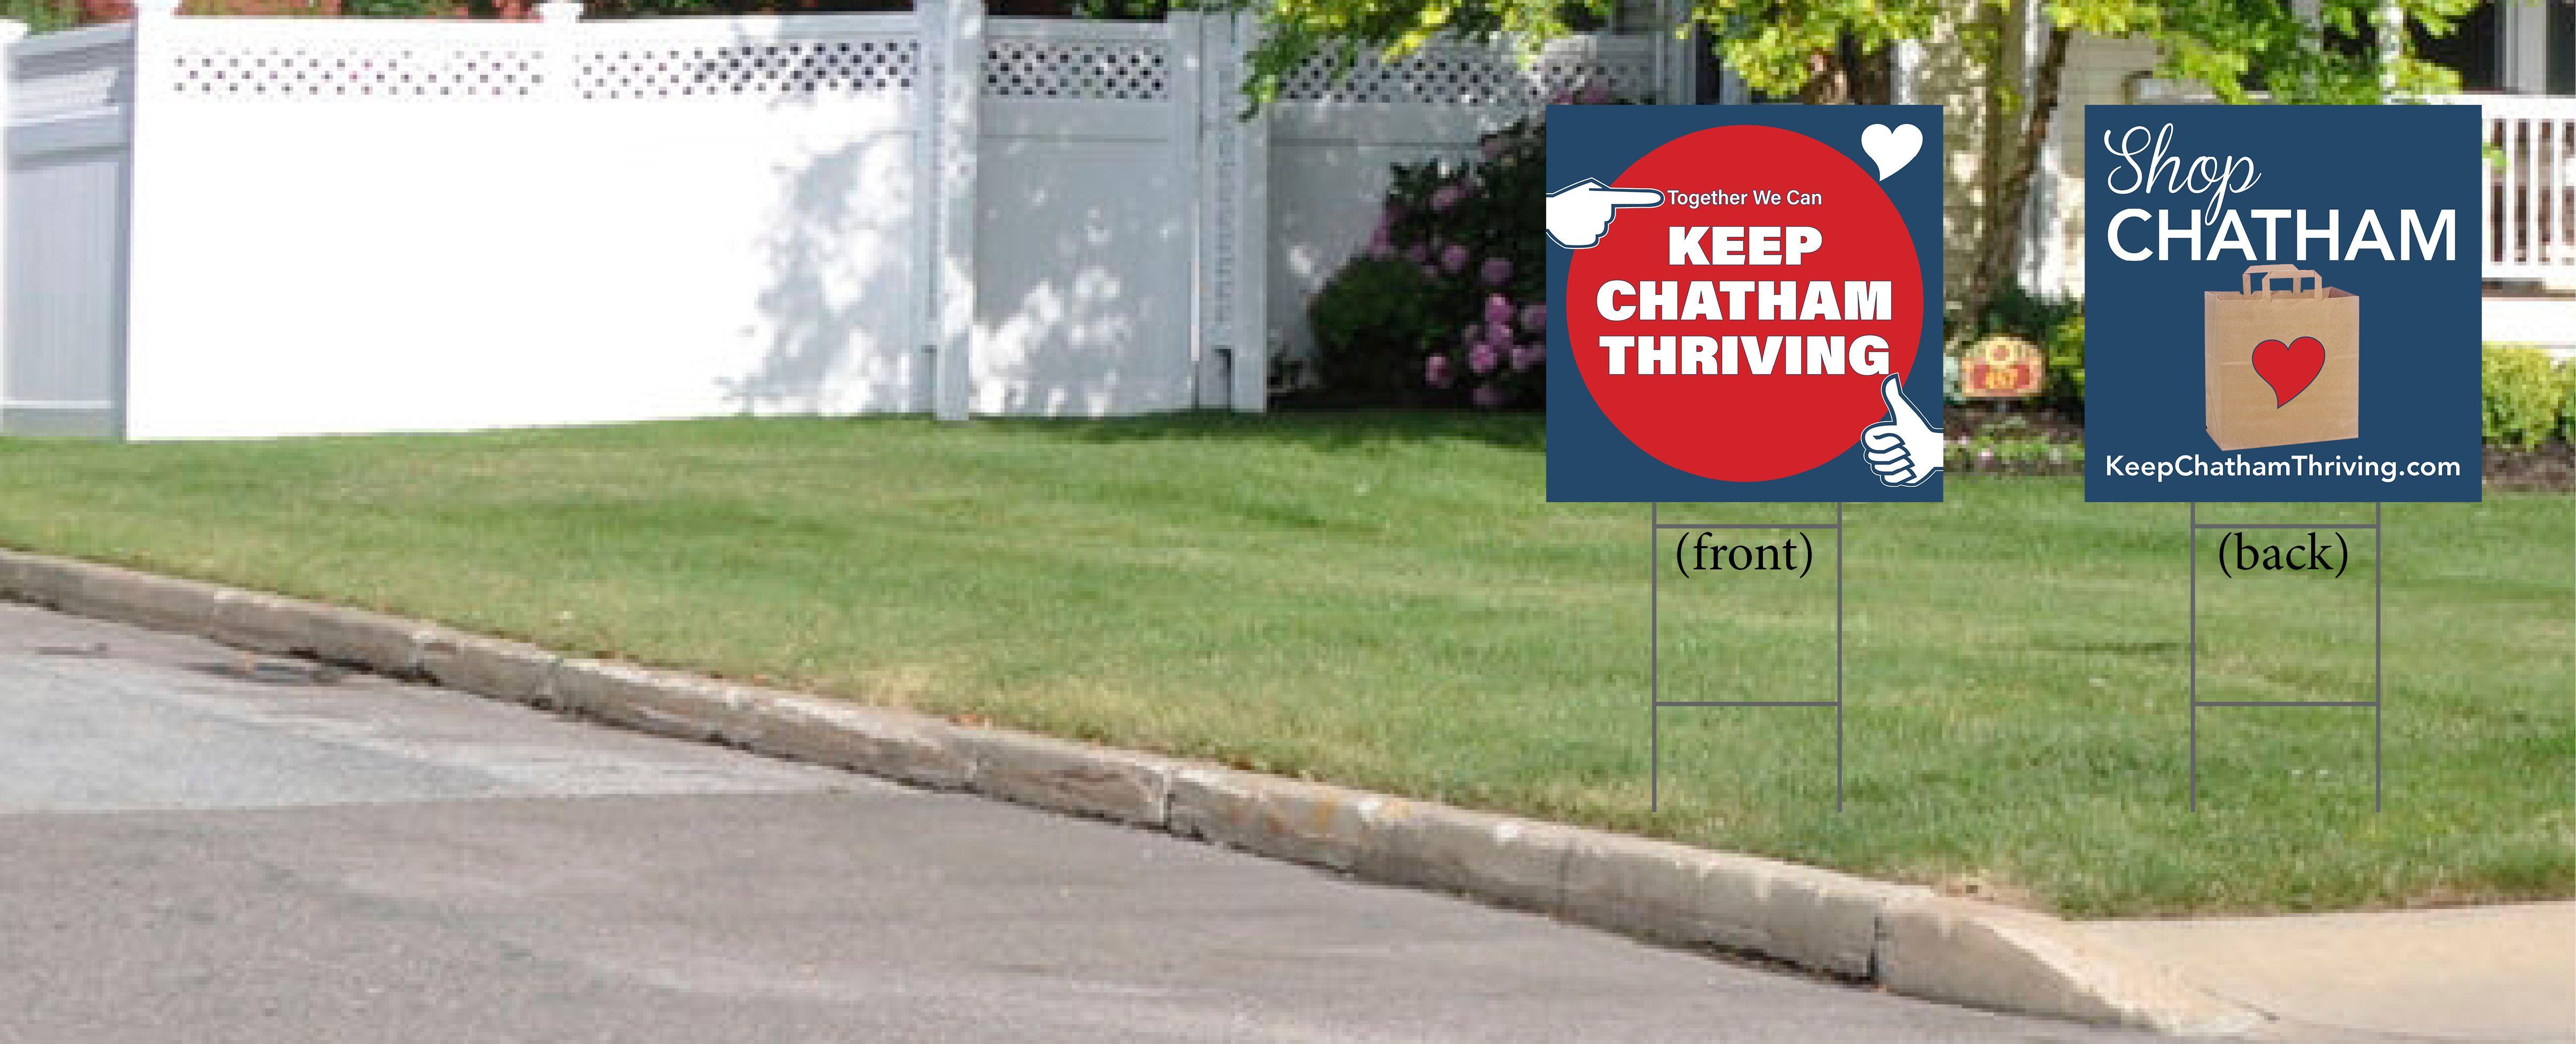 """Shop Chatham"" Lawn Signs"